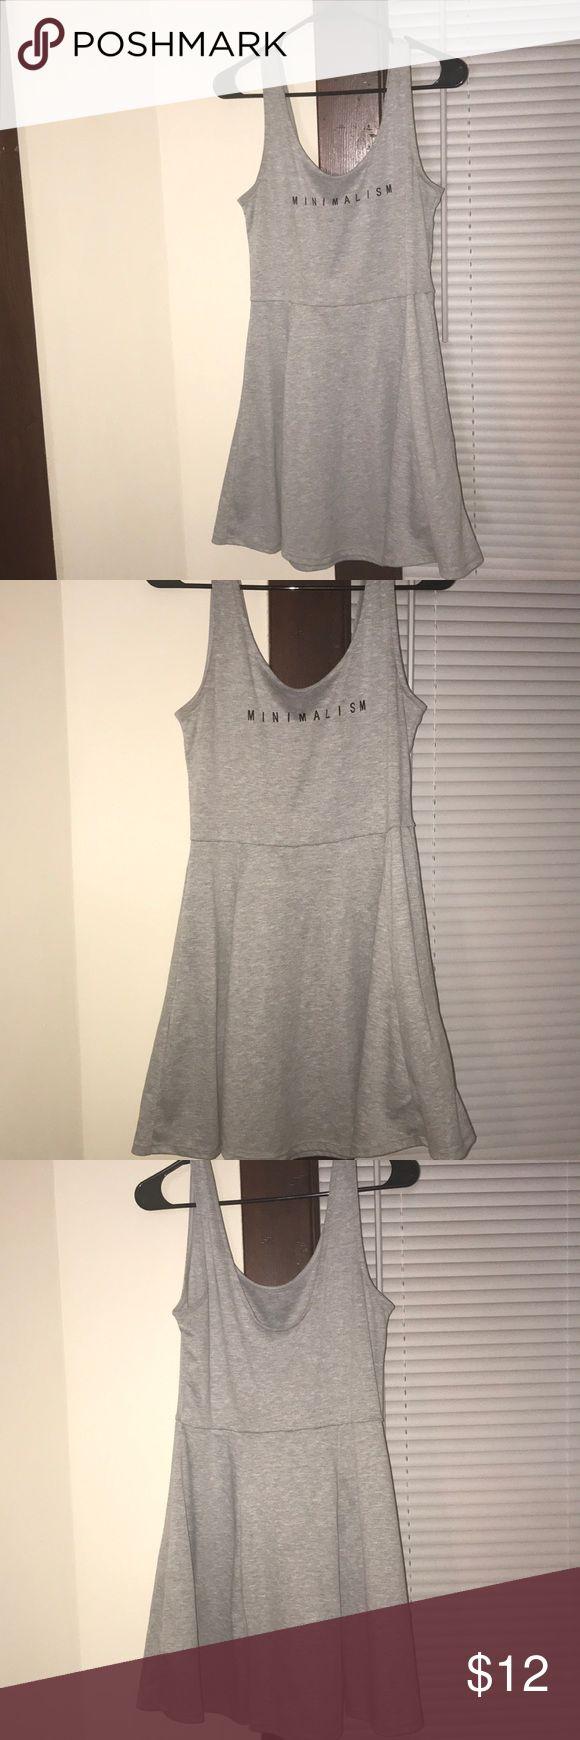 "Grey Dress Grey short dress , cute for summer says ""minimalism"". Dresses Mini"